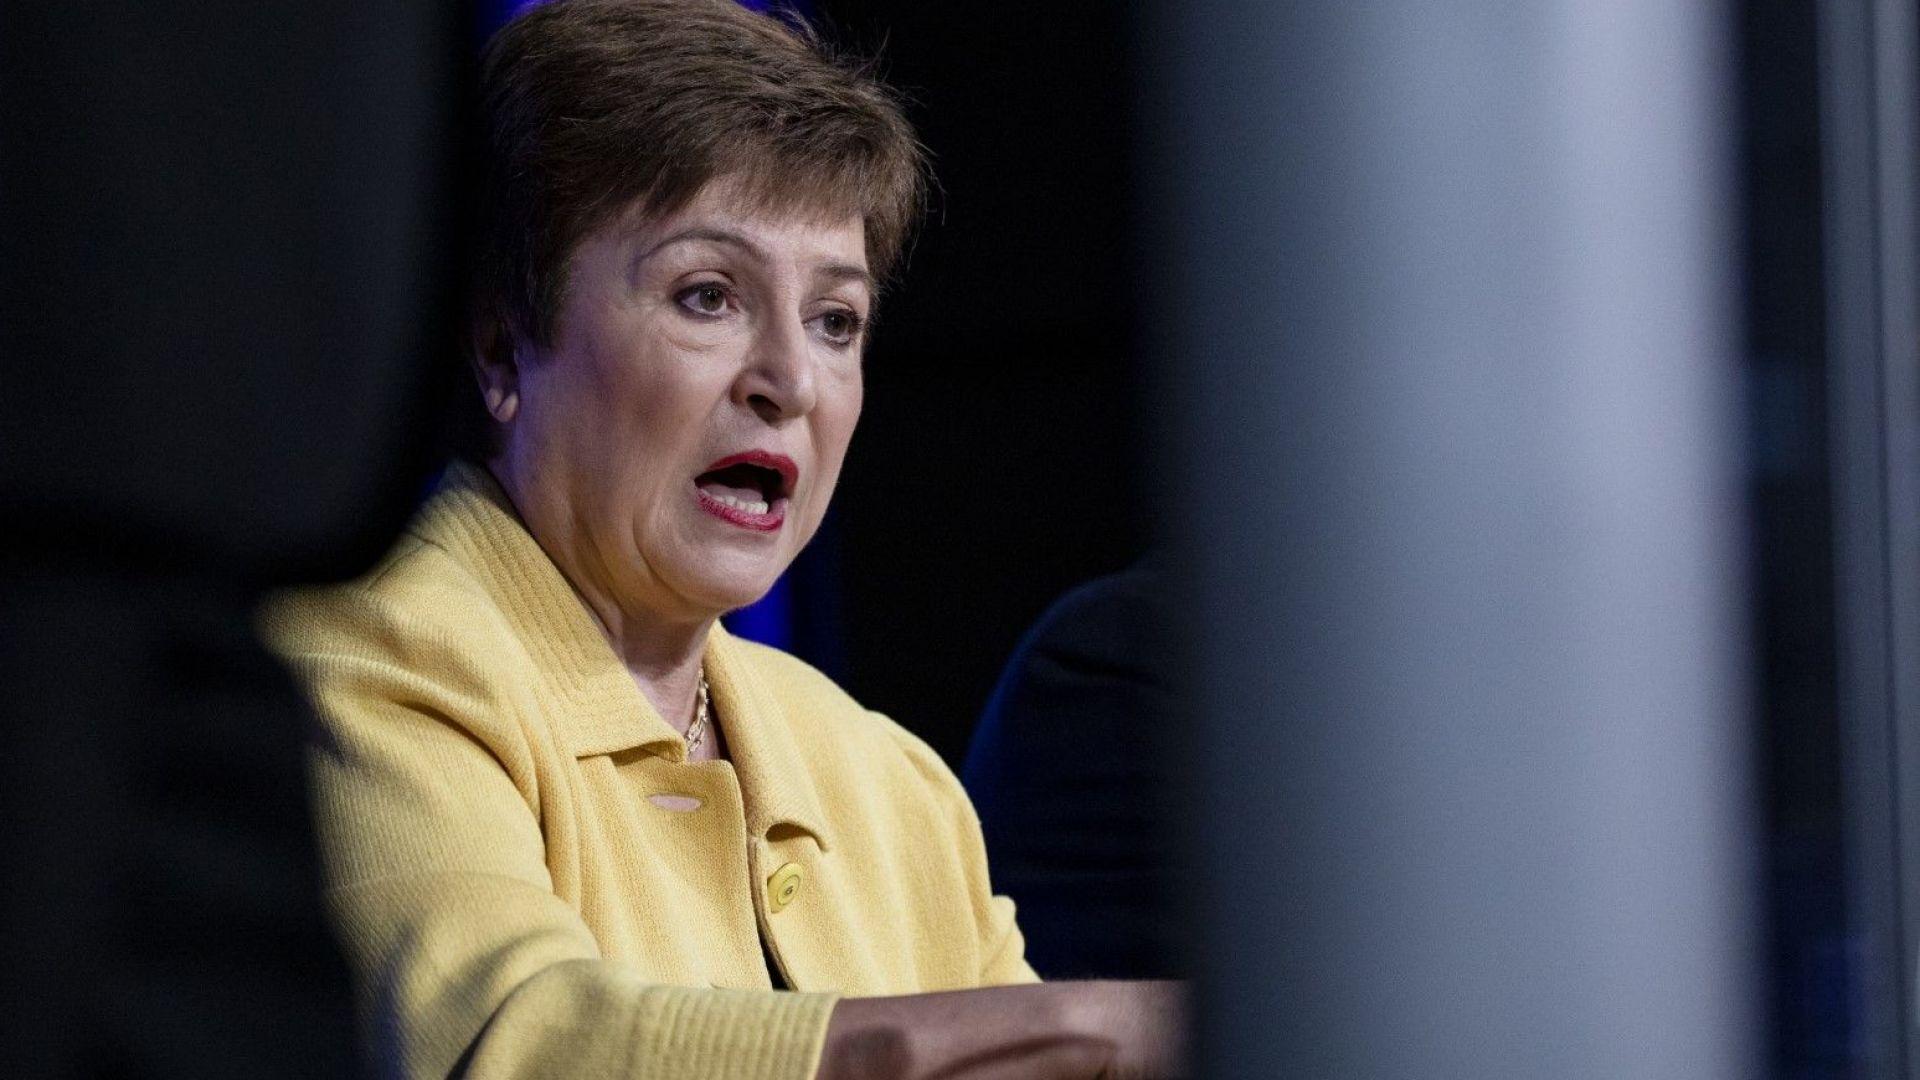 Кристалина Георгиева призова да се помогне на нововъзникващите пазарни икономики